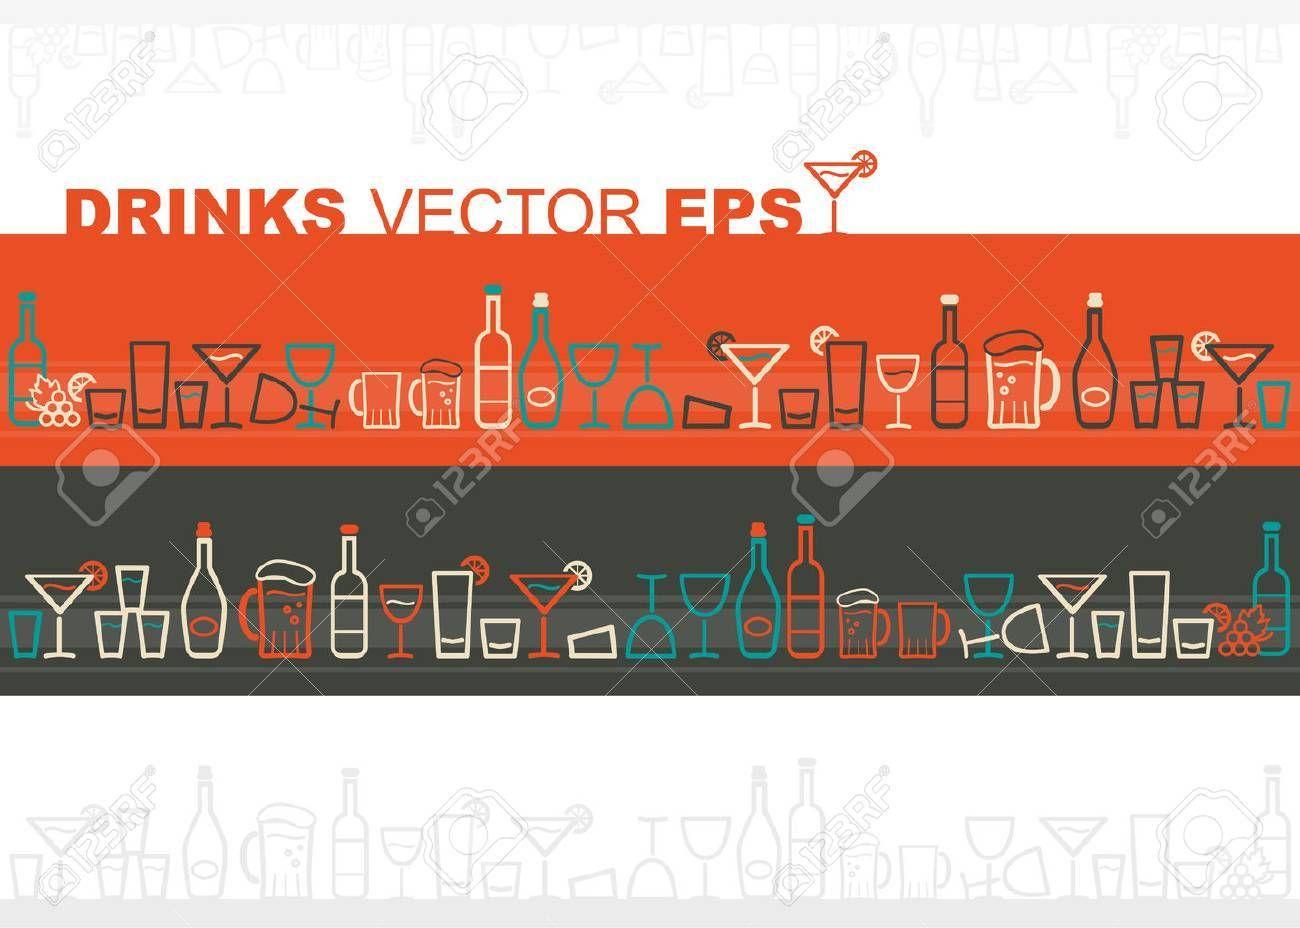 Wine And Drinks Border Affiliate Wine Drinks Border Graphics Inspiration Motion Graphics Inspiration Drinks